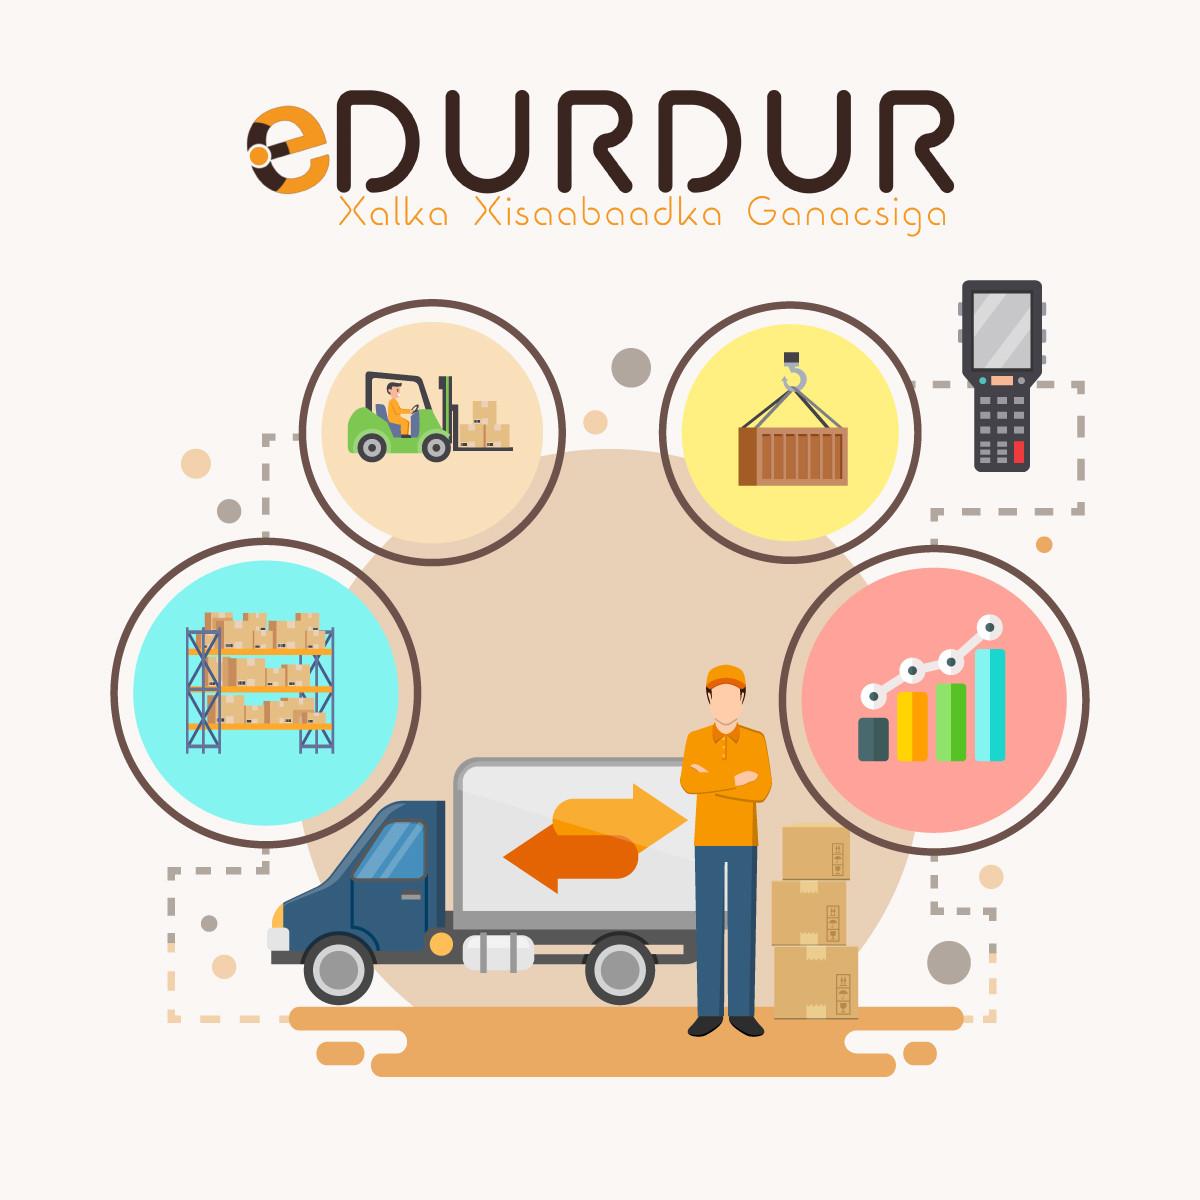 eDURDUR - Inventory Management System